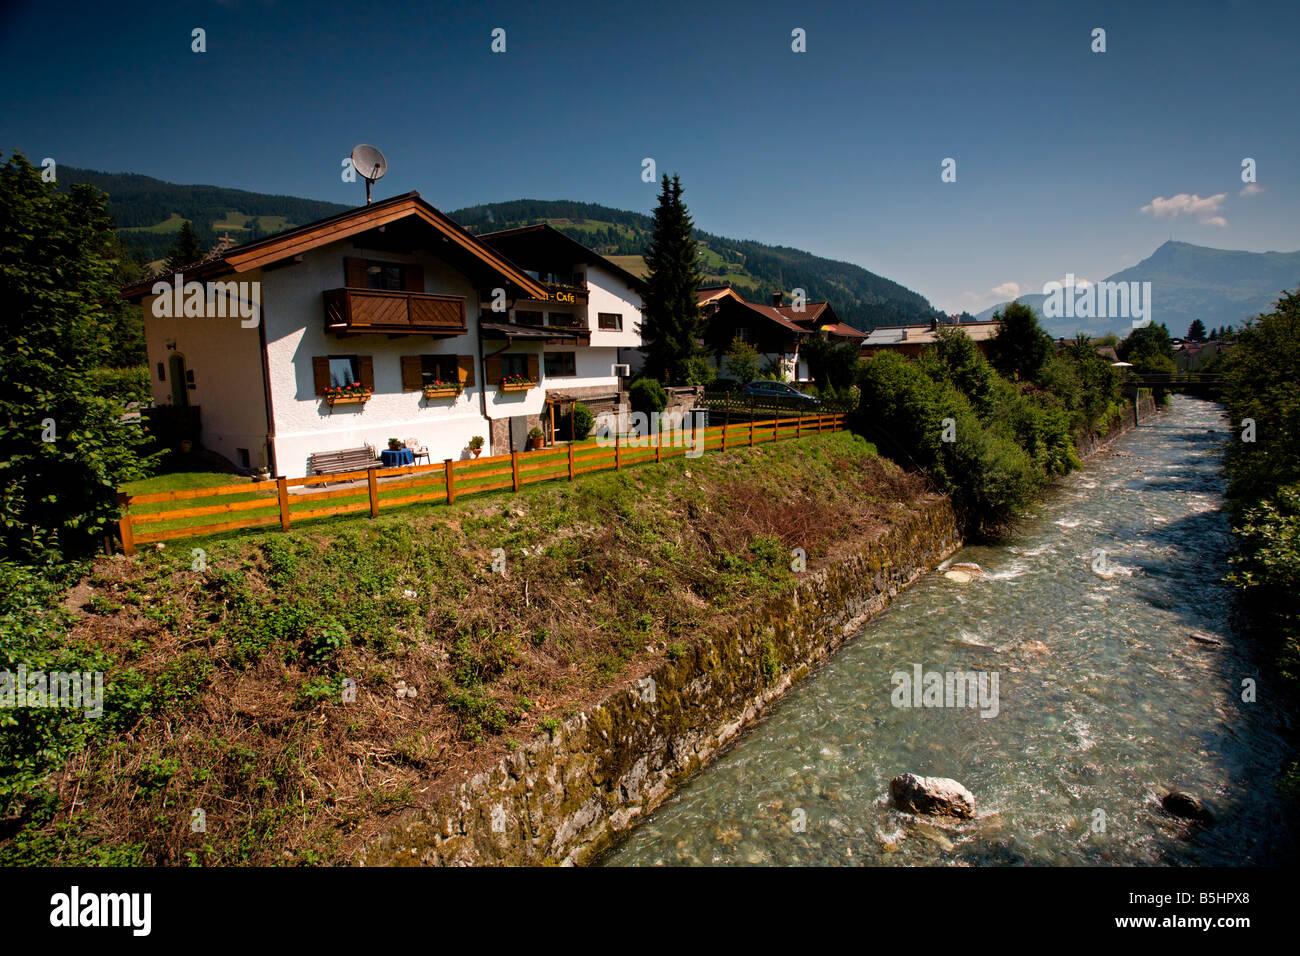 Austria: Tyrol: Kirchberg - Stock Image